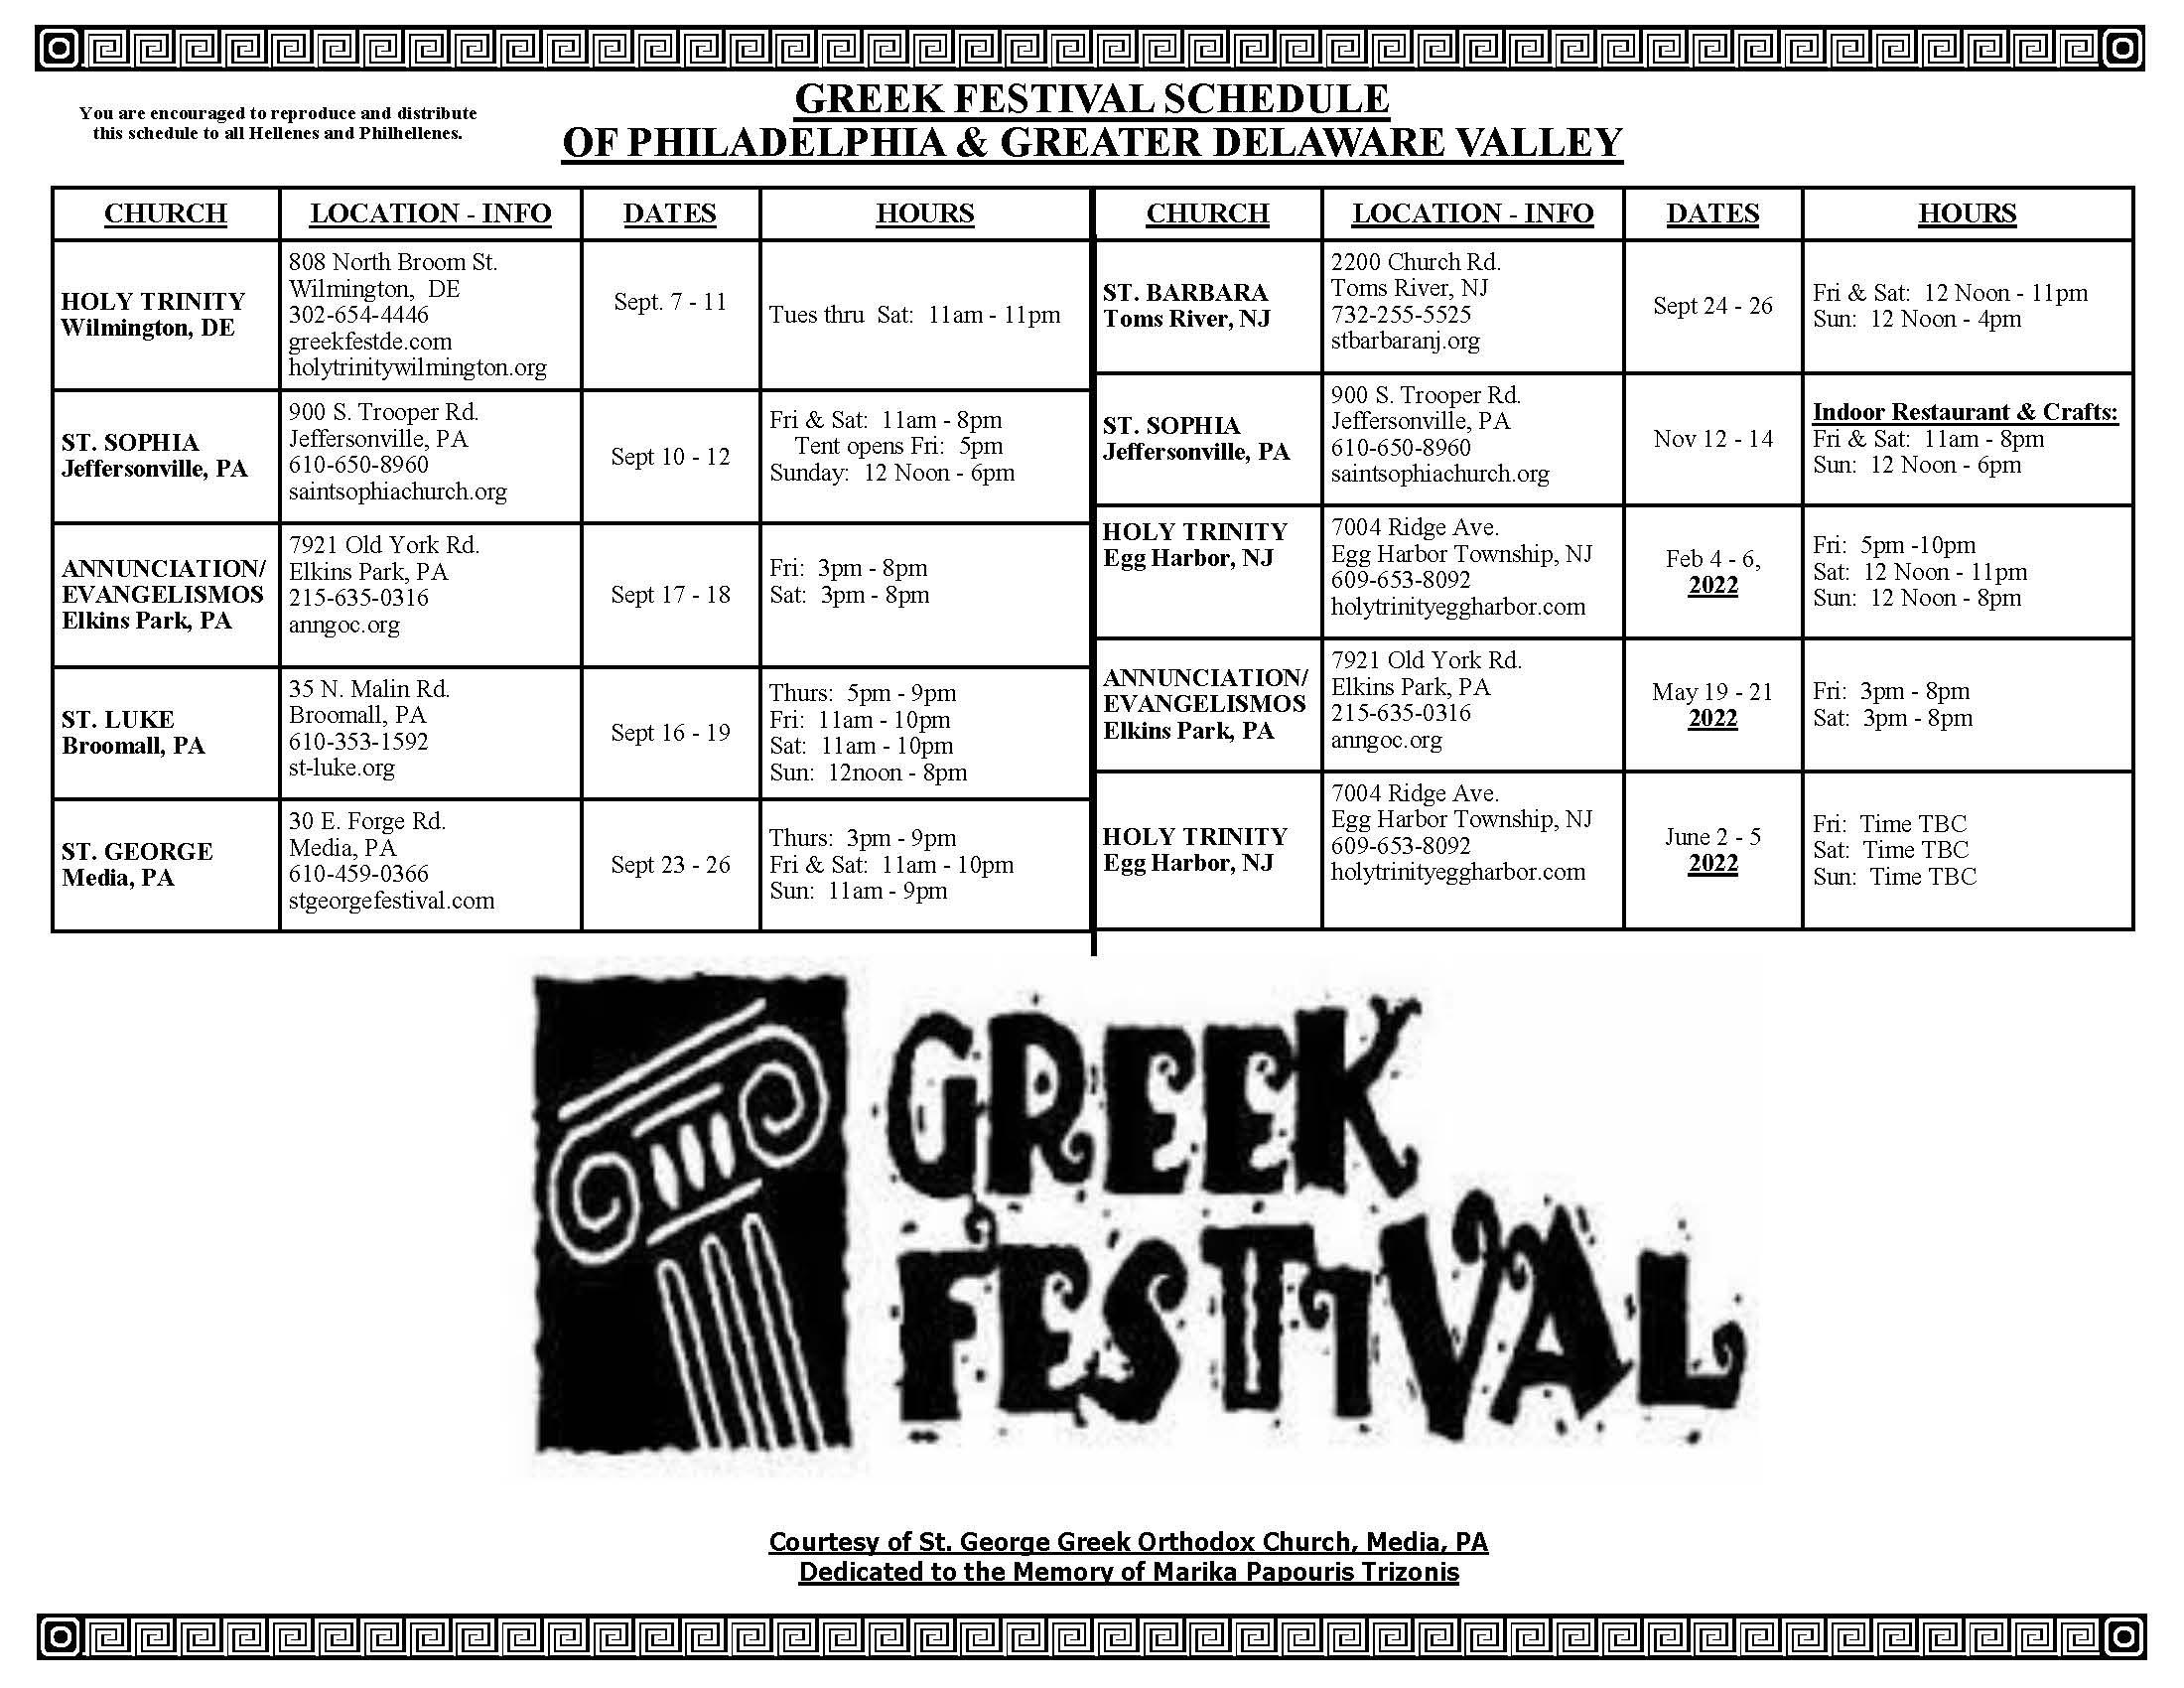 2021 GREEK FESTTVAL SCHEDULE(sv)